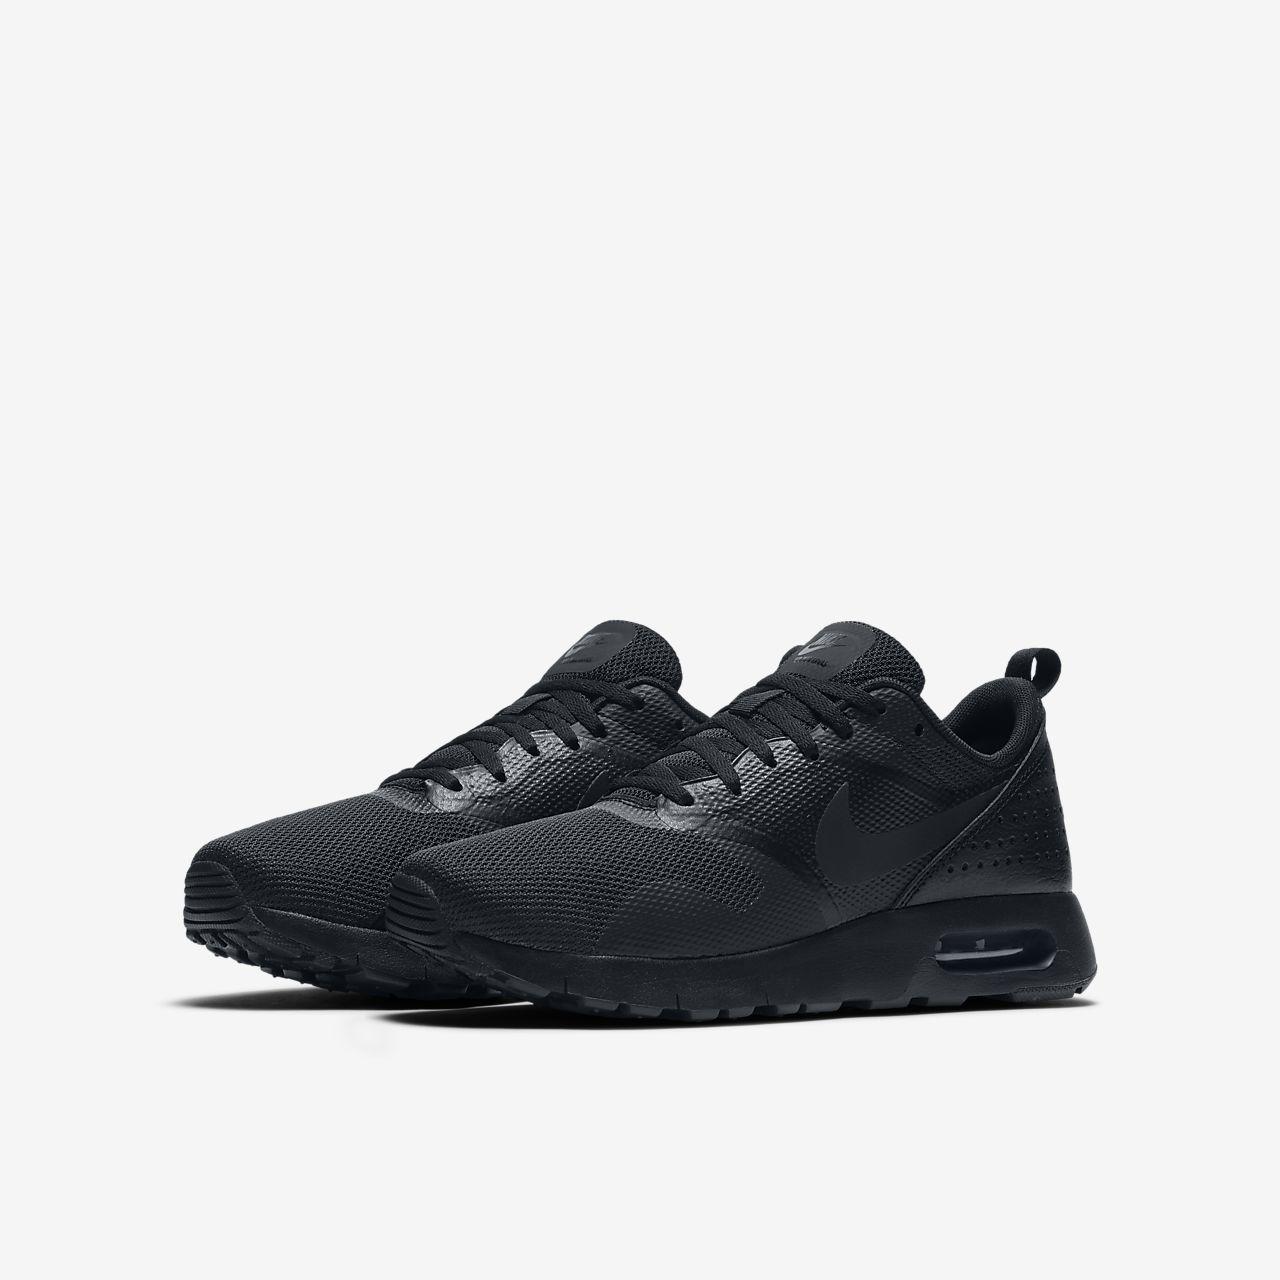 low priced 9268b 7f4a9 ... Nike Air Max Tavas Older Kids  Shoe